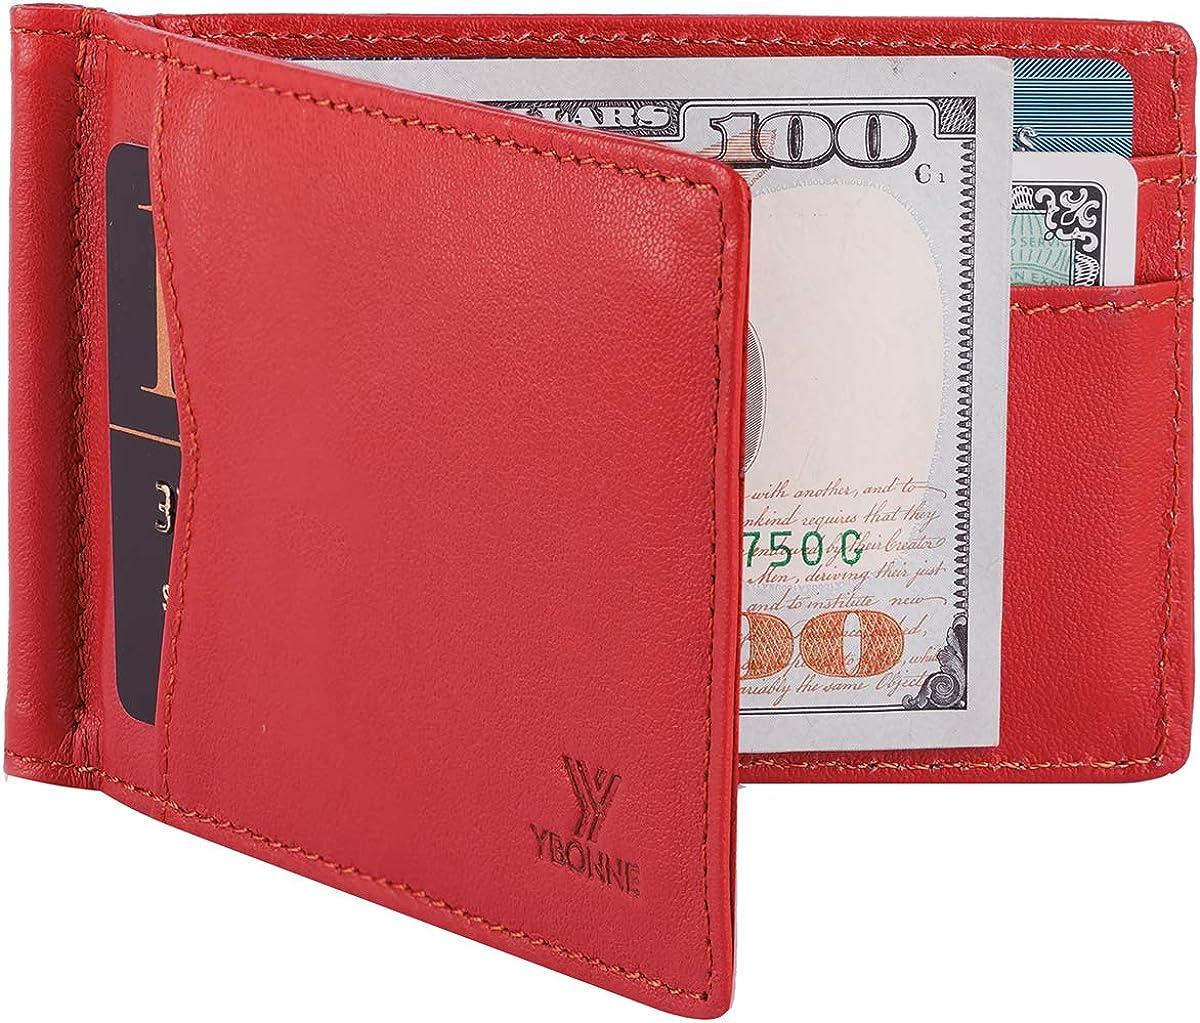 YBONNE Slim Wallet With...